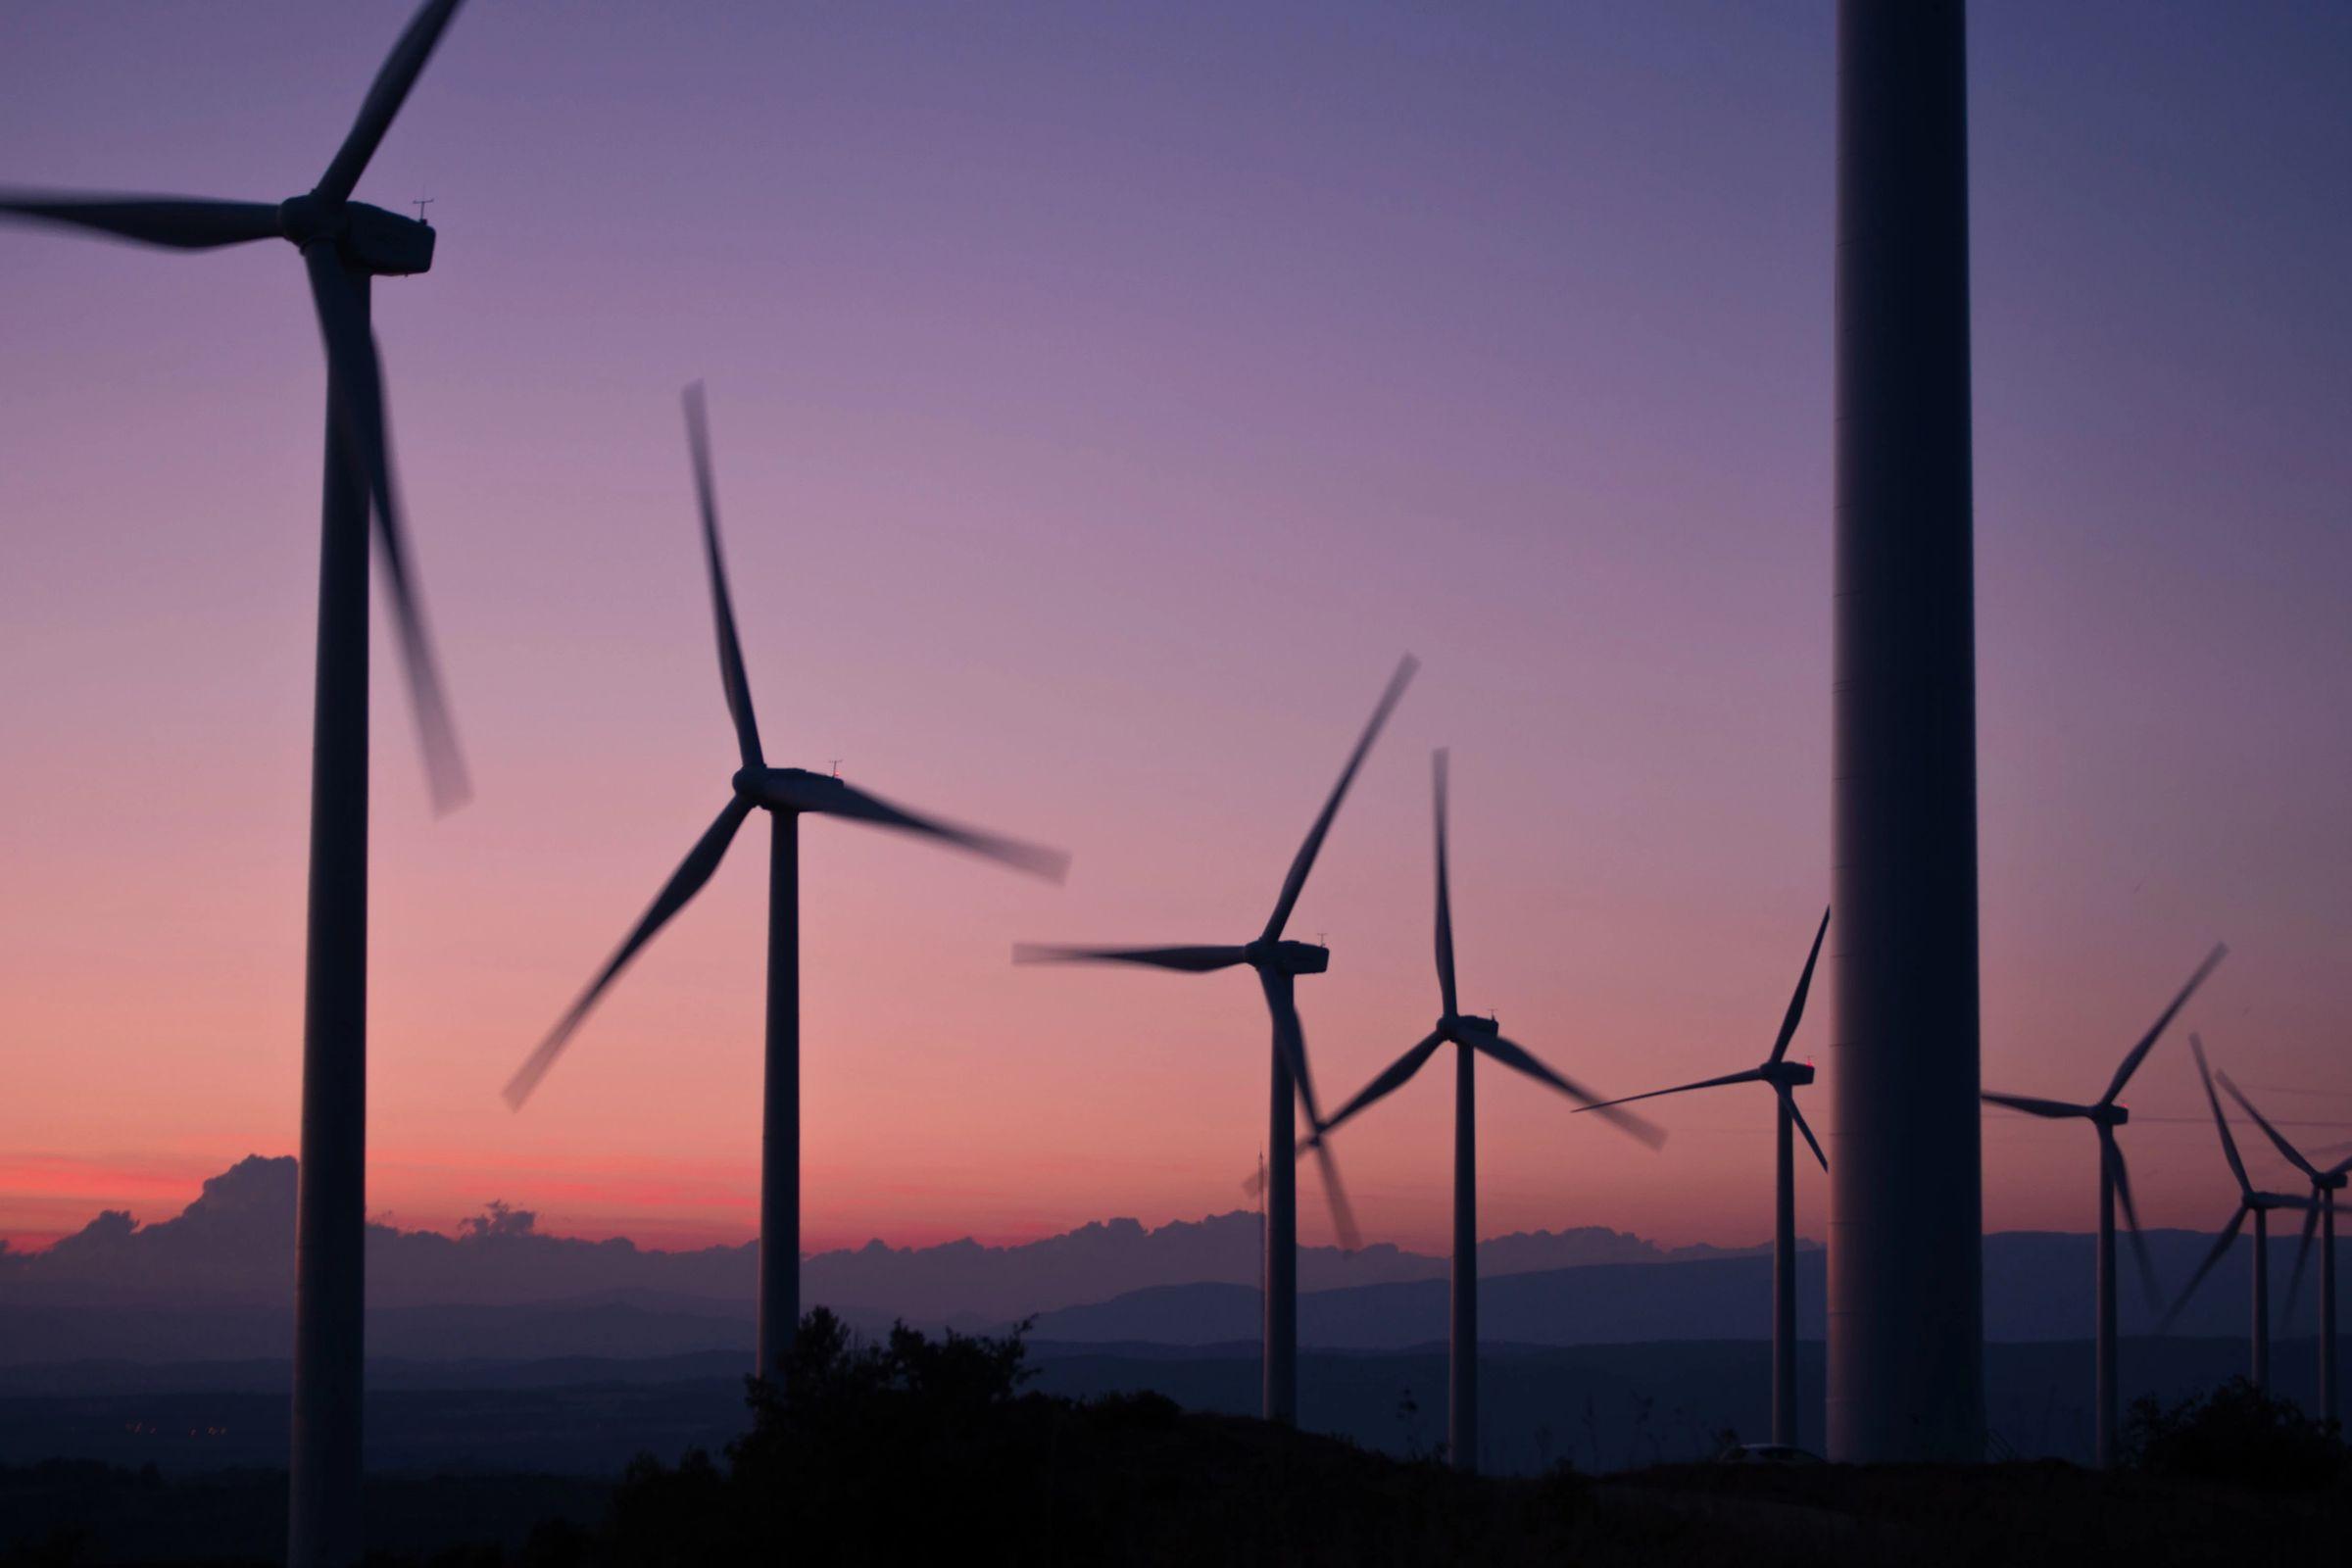 Wind turbine power generation performance